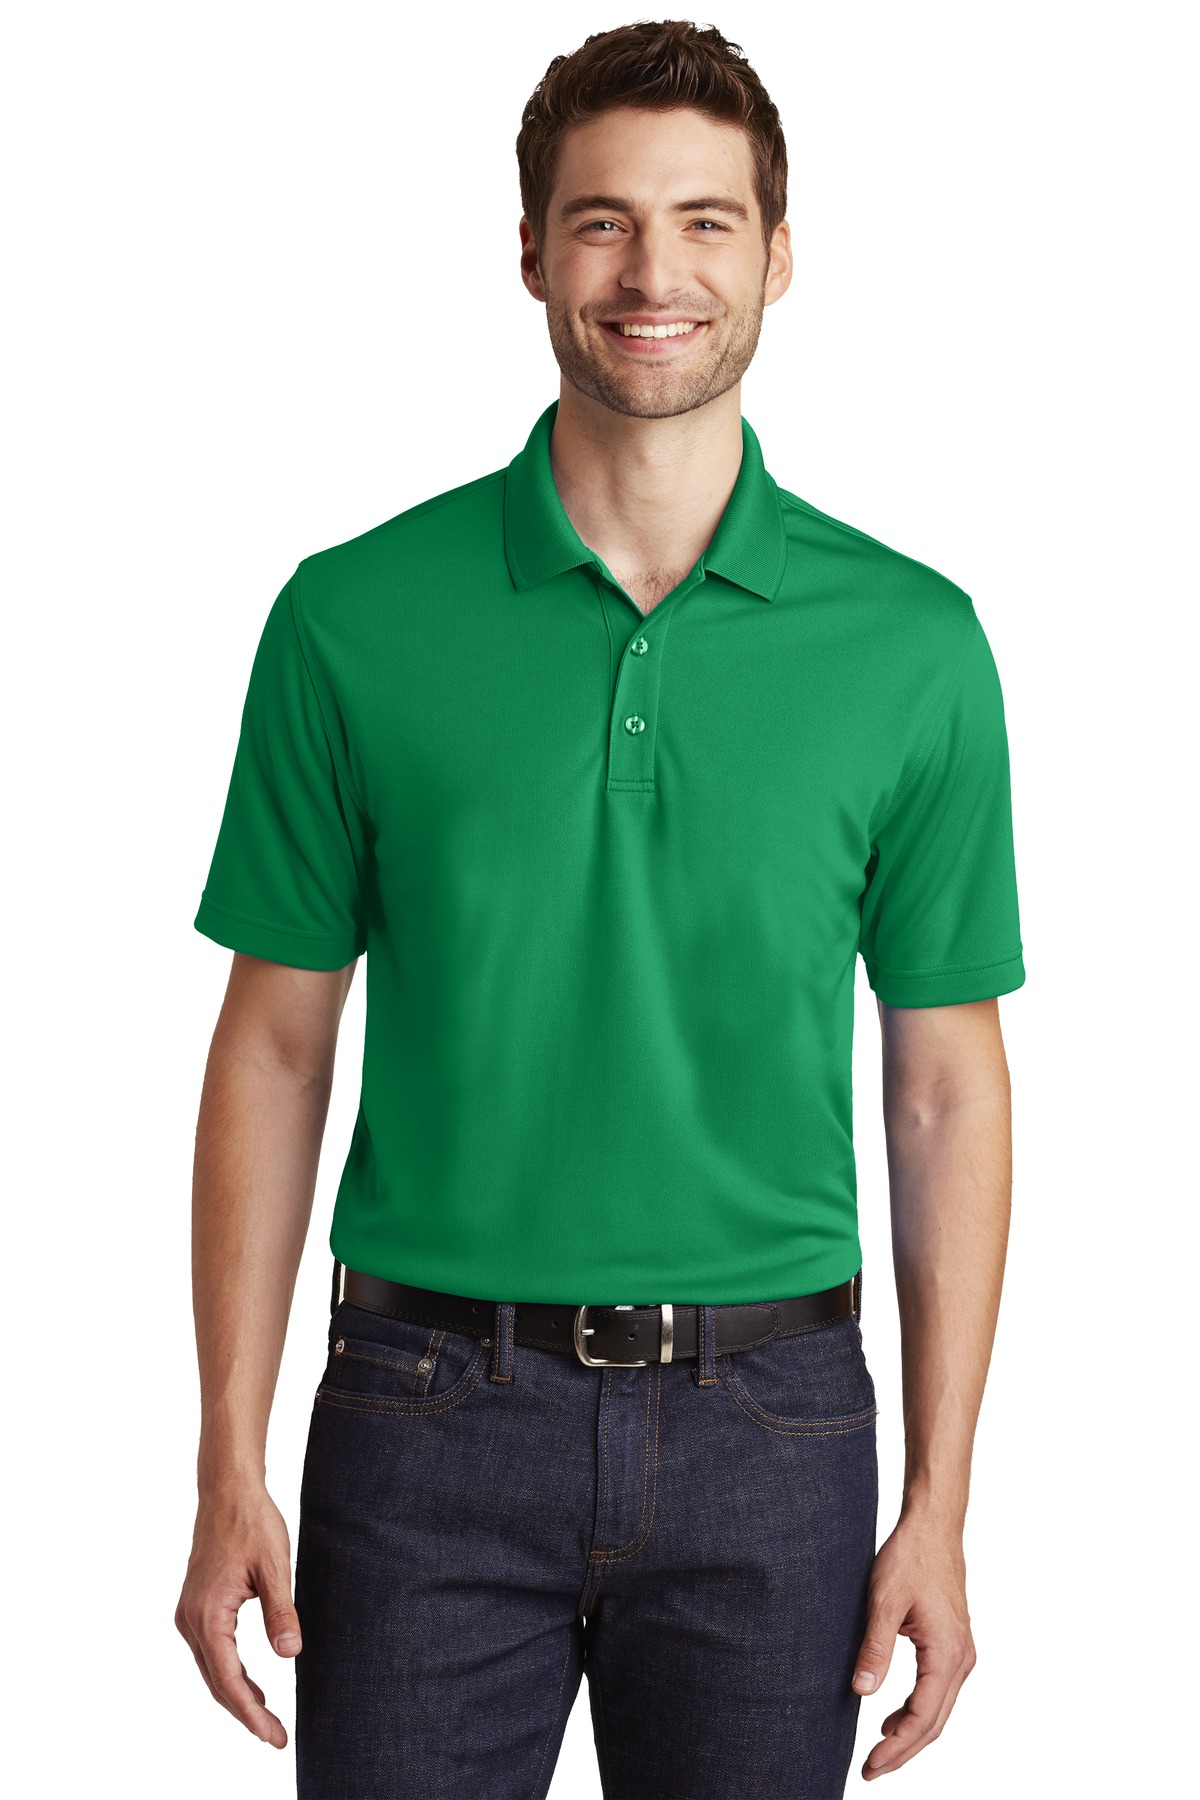 Men's UV Micro-Mesh Dry Zone Polo-